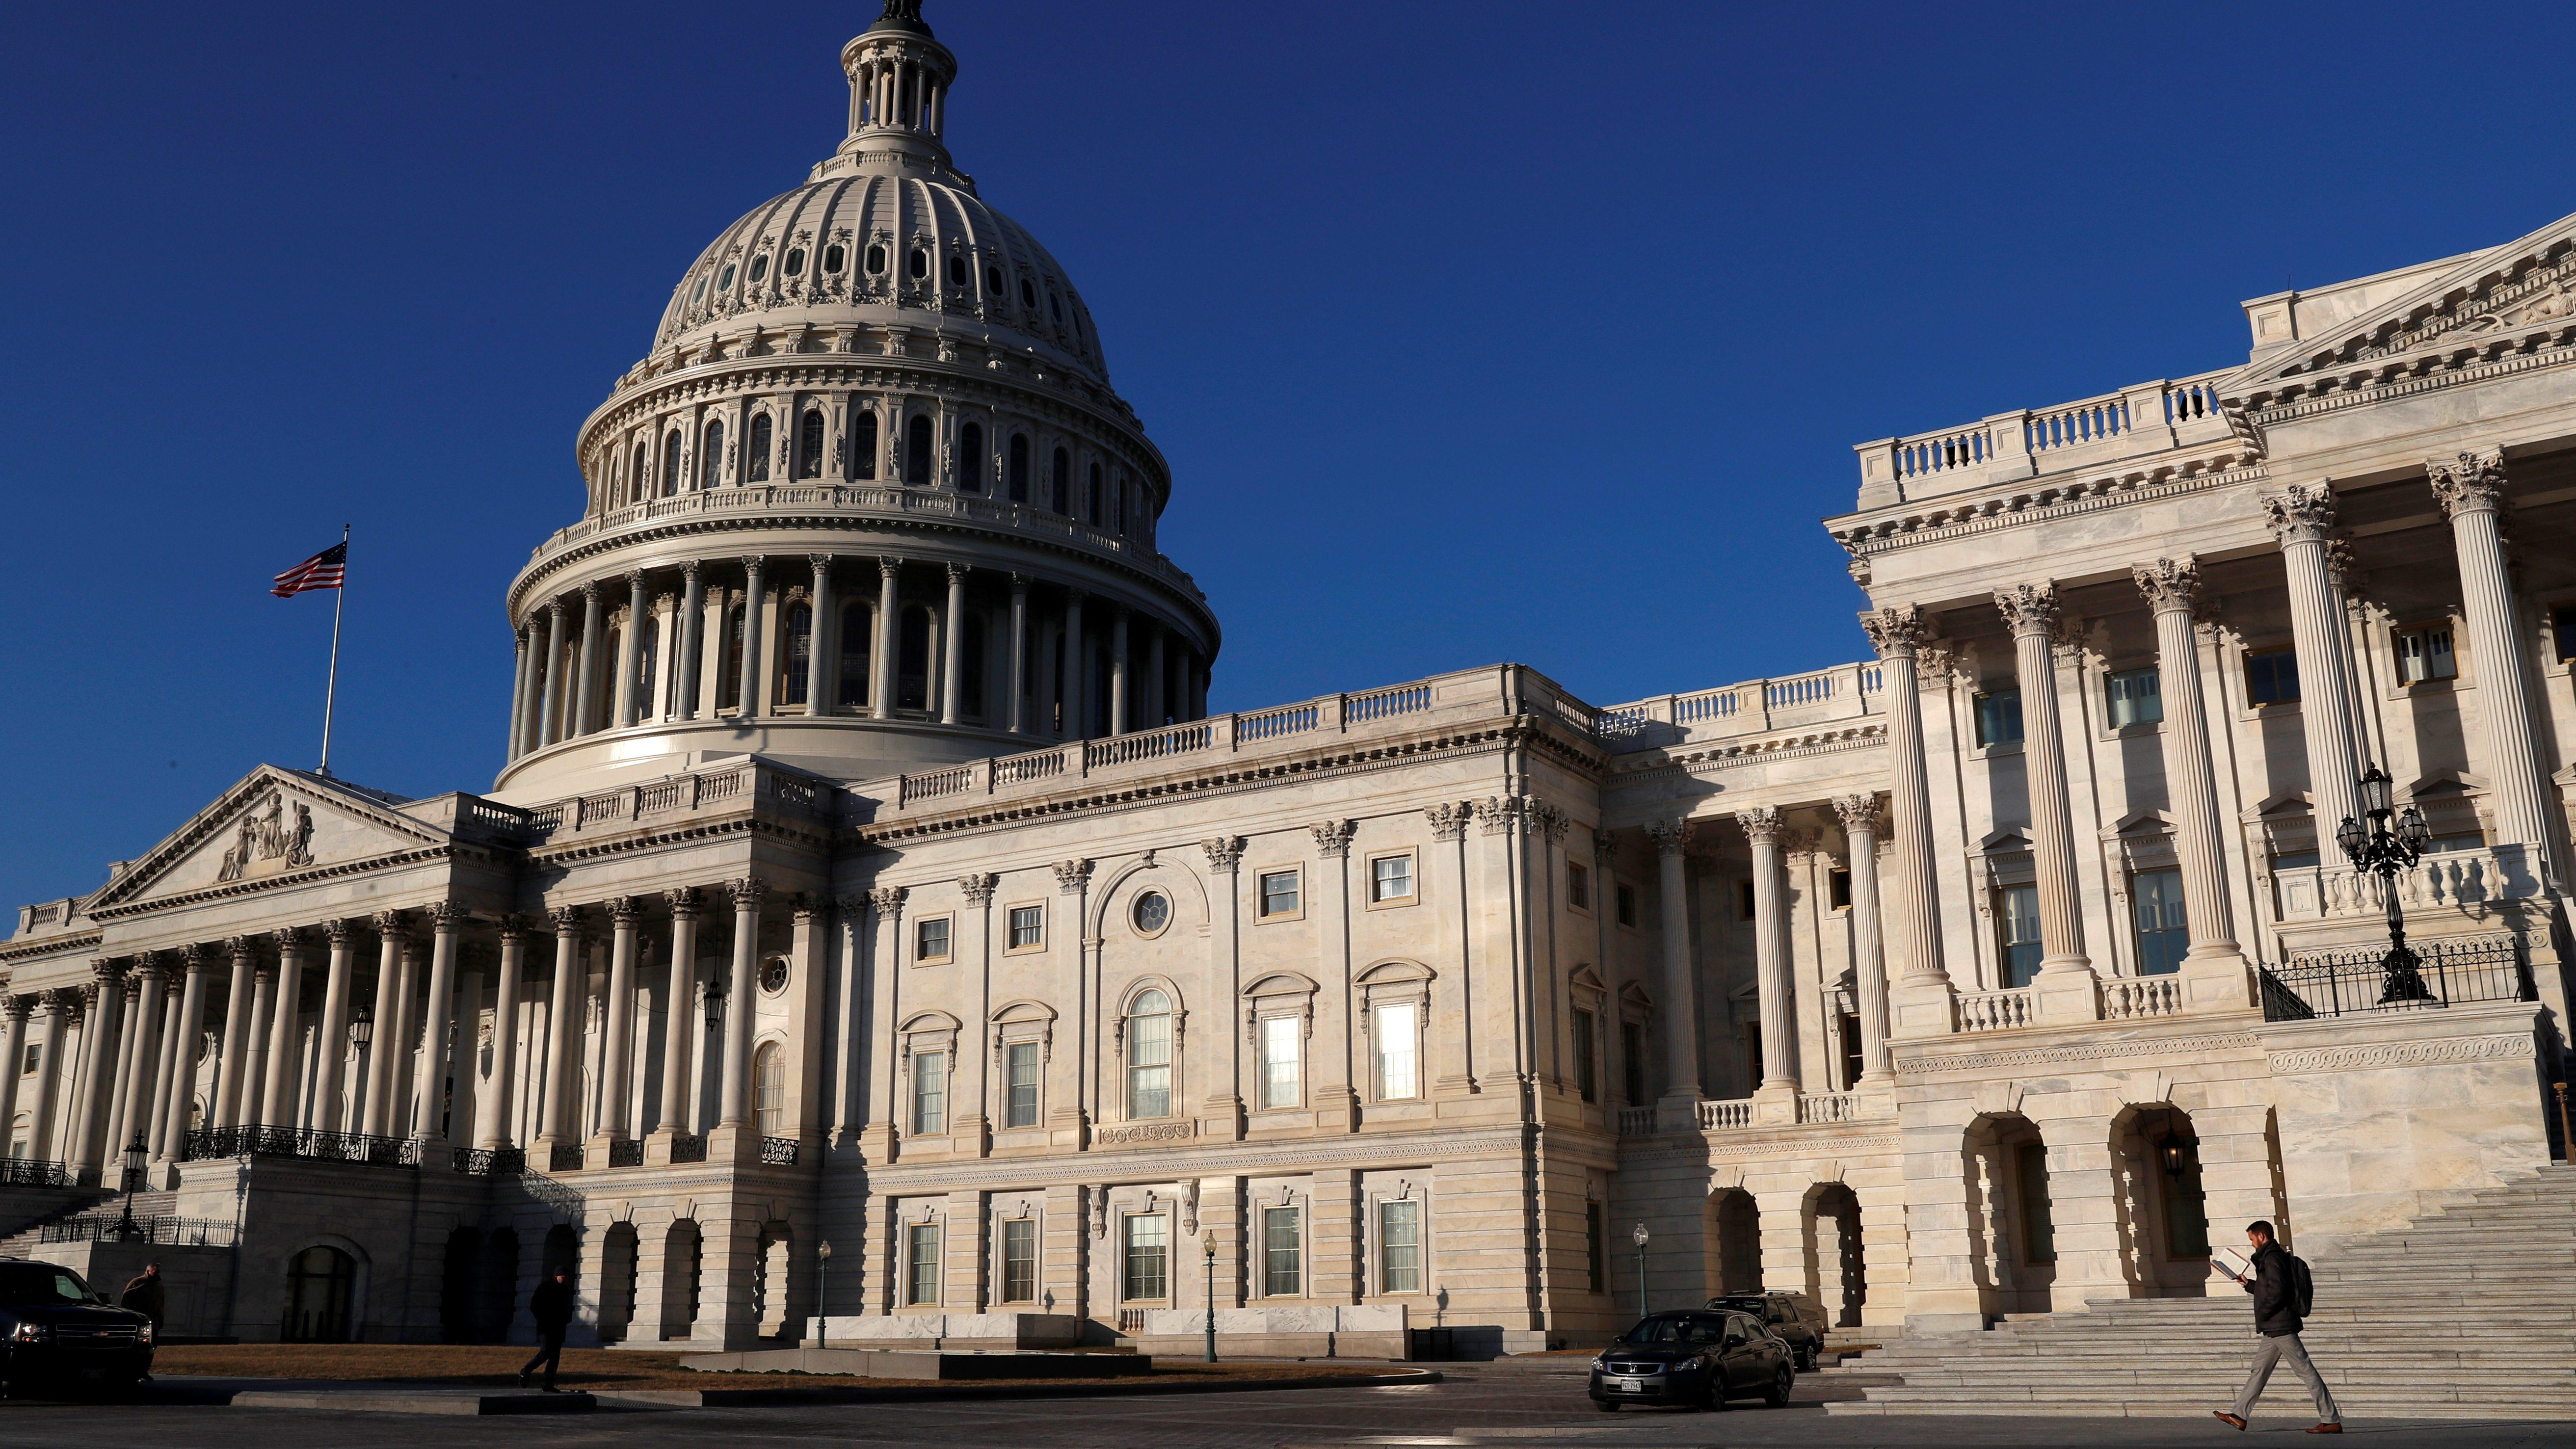 People walk by the U.S. Capitol building in Washington, U.S., February 8, 2018. REUTERS/ Leah Millis - RC13B8F2EB90